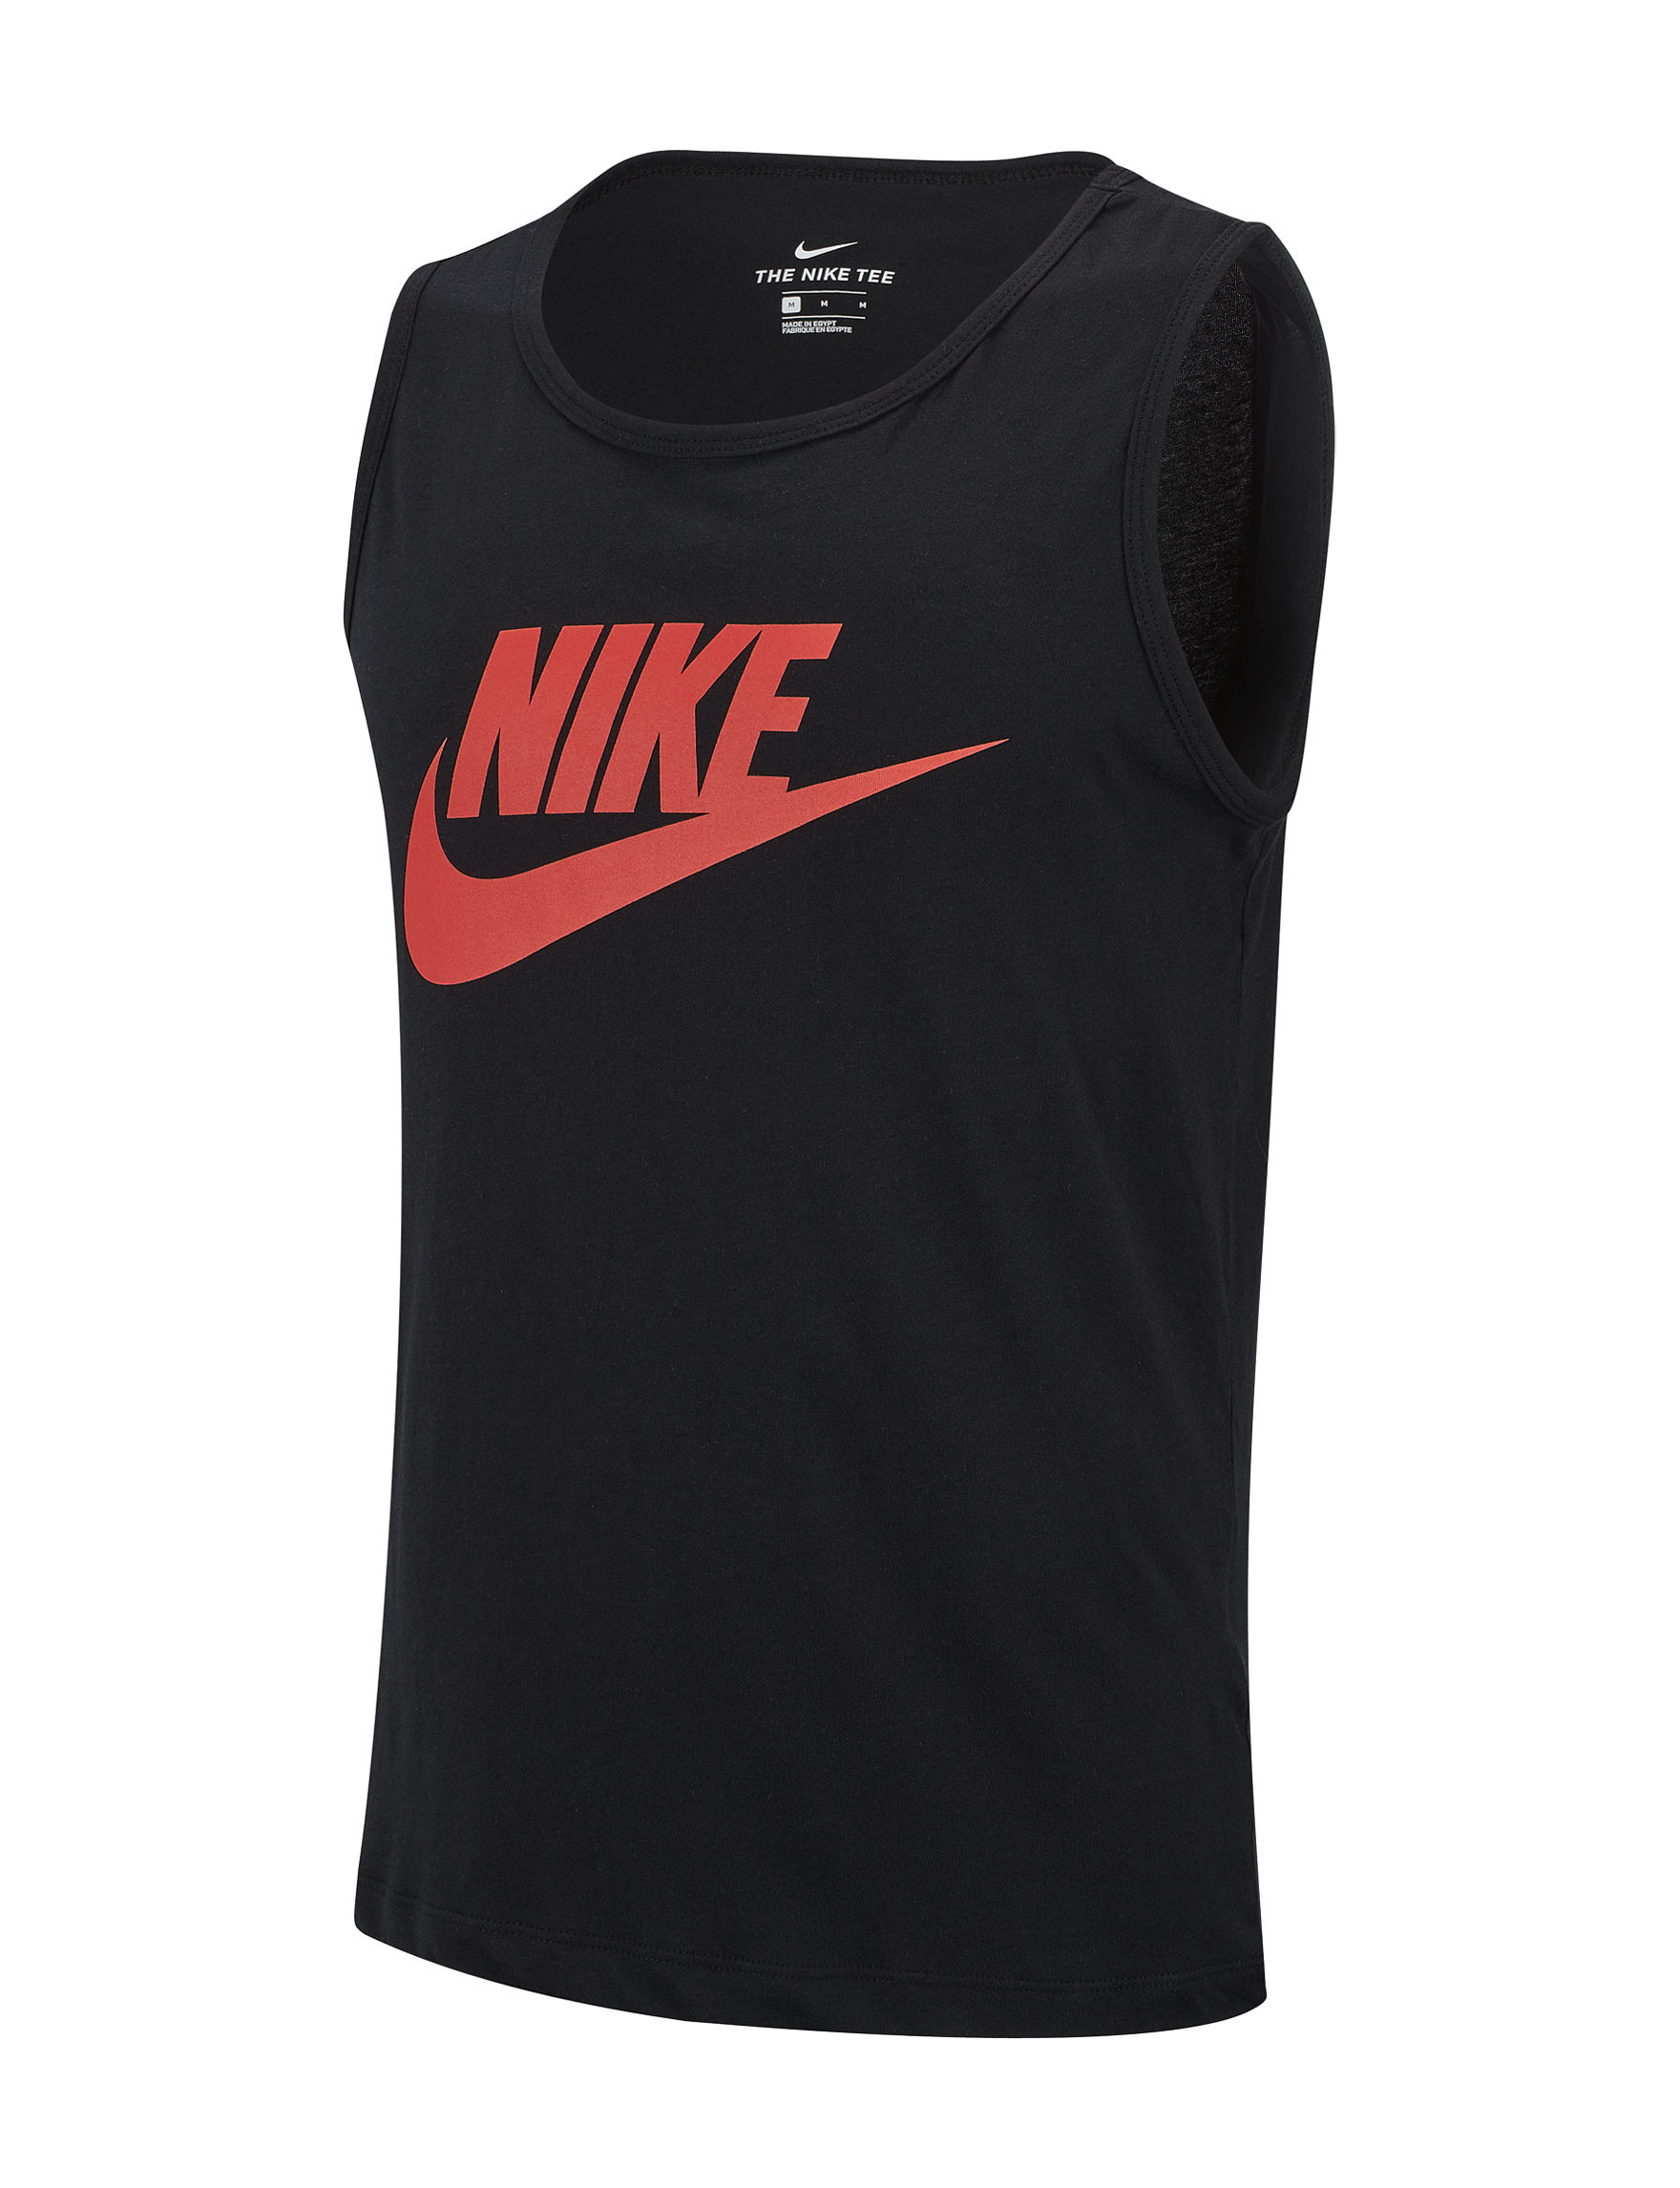 Nike Black / Red Tees & Tanks